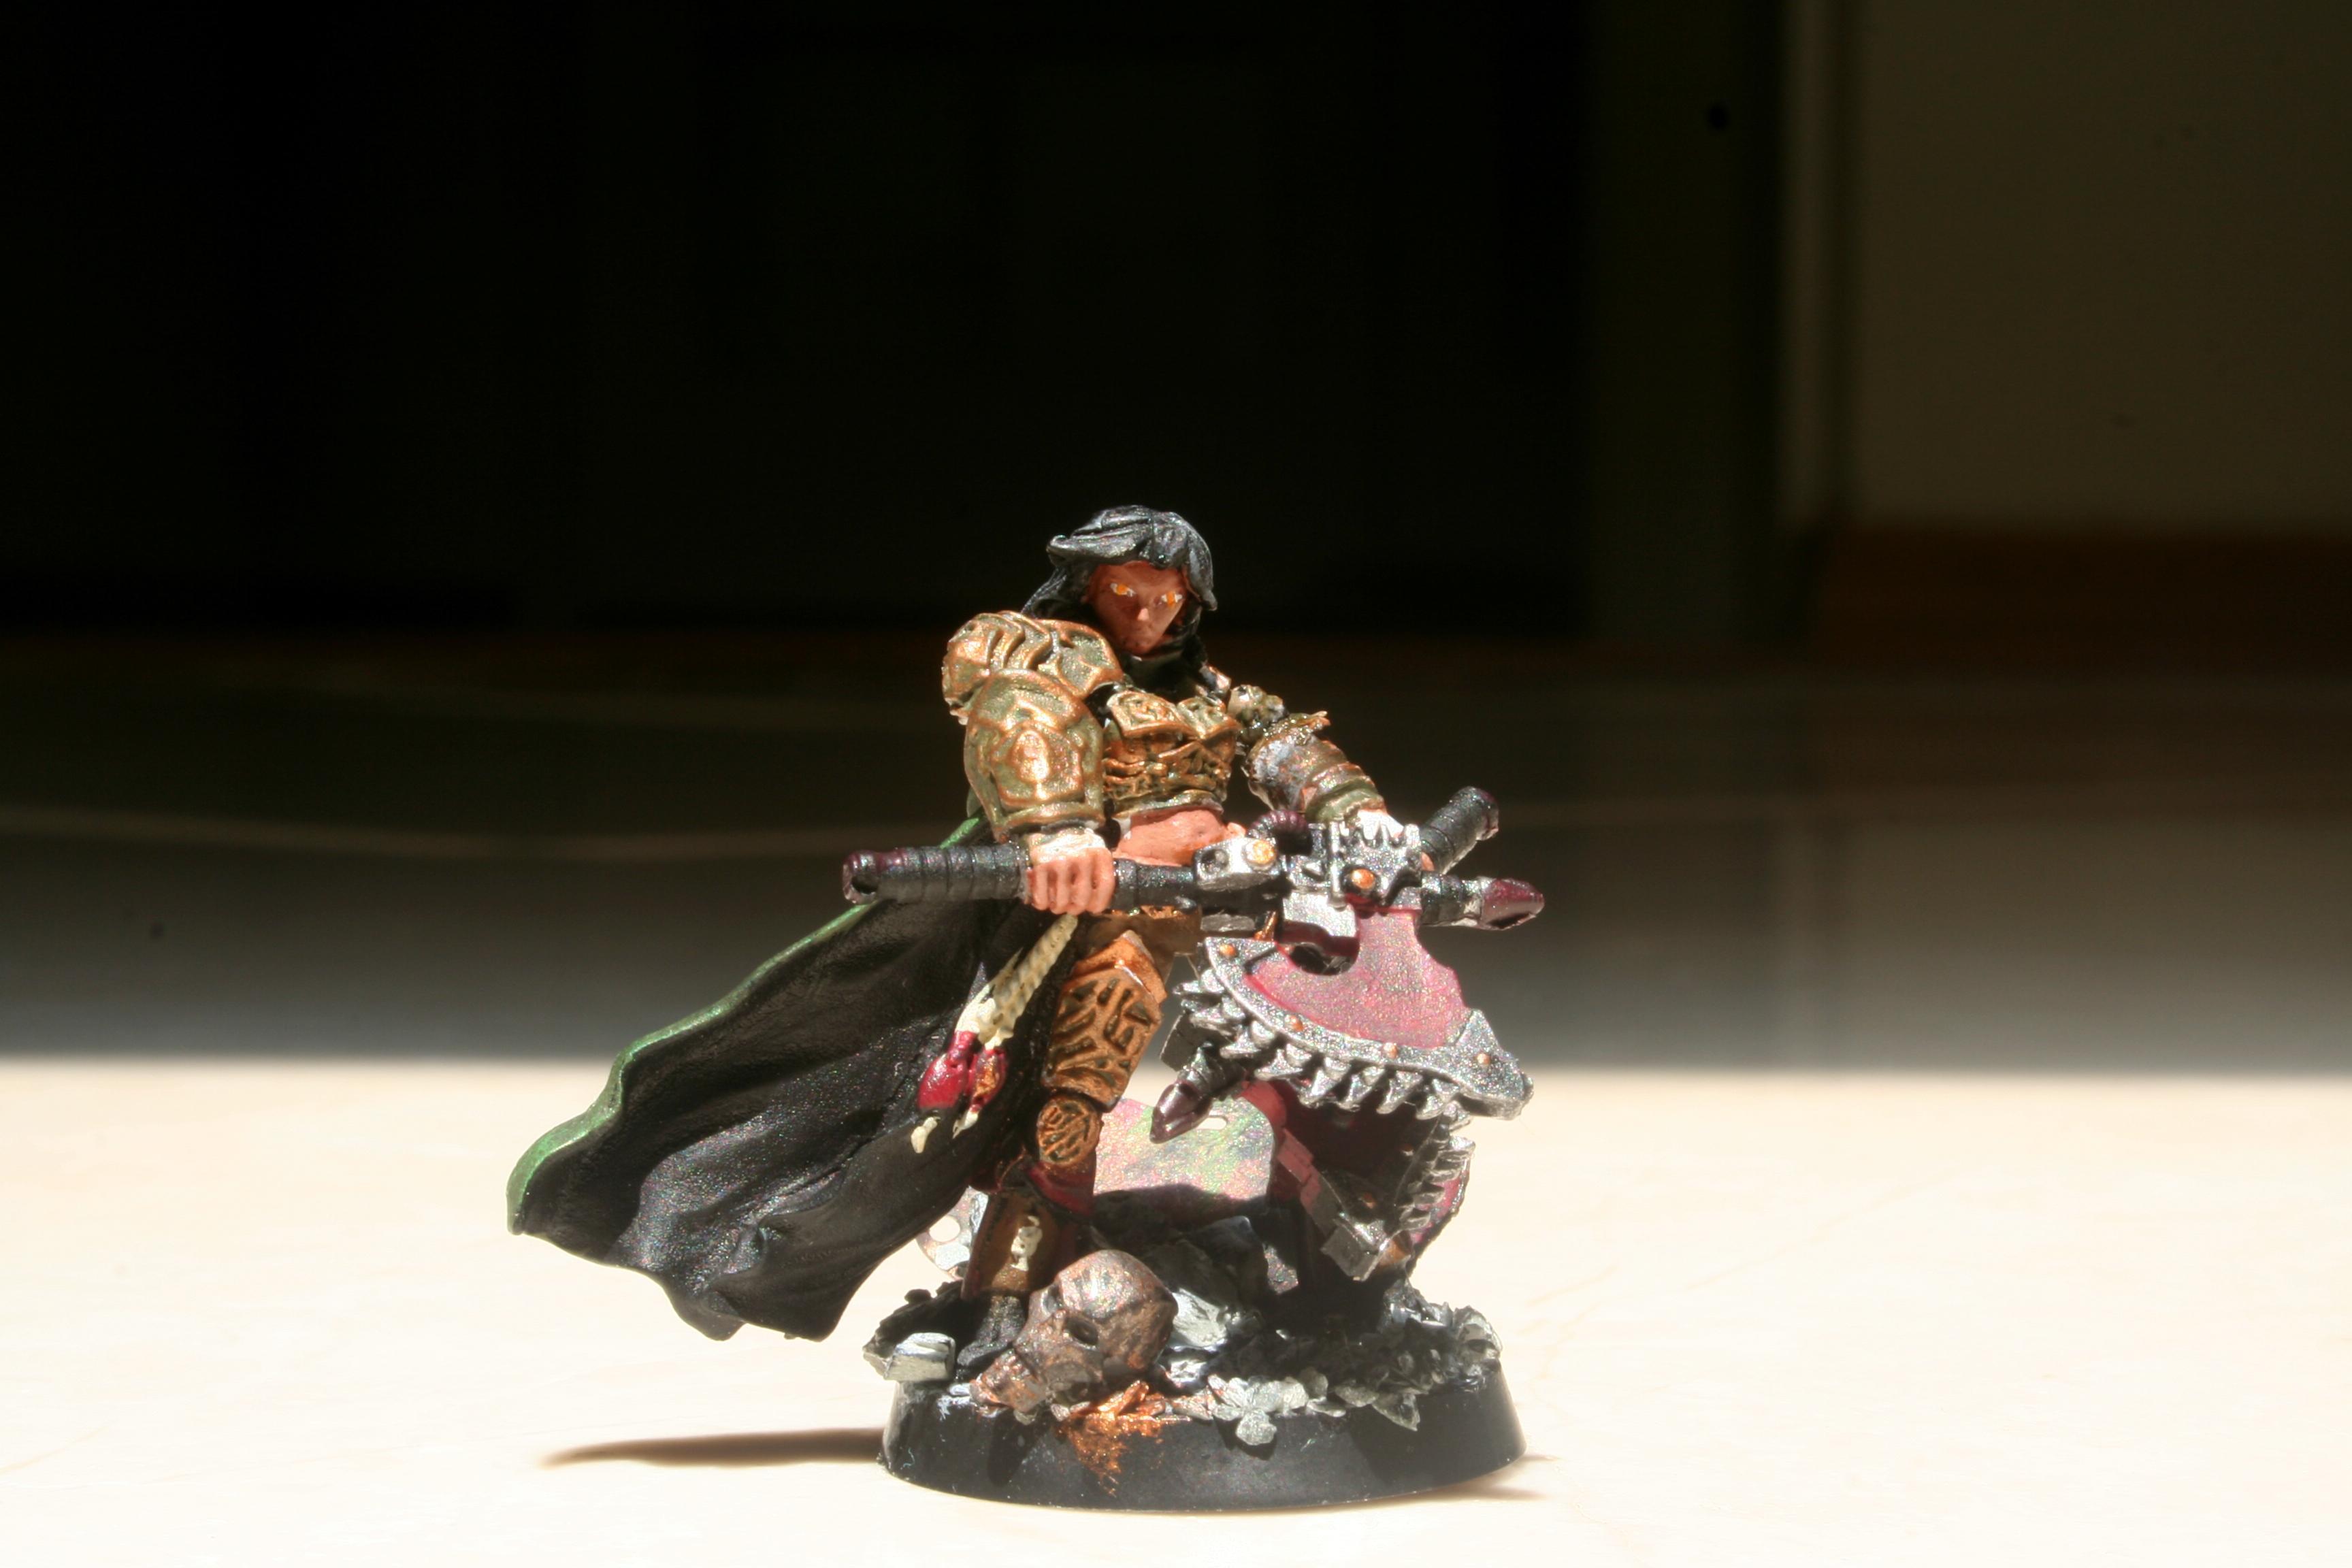 Base, Chain Axe, Dark Heresy, Dual Wield, Female, Girl, Guardsmen, Kaya, Kaya The Wildborne, Necron Skull, Rpg